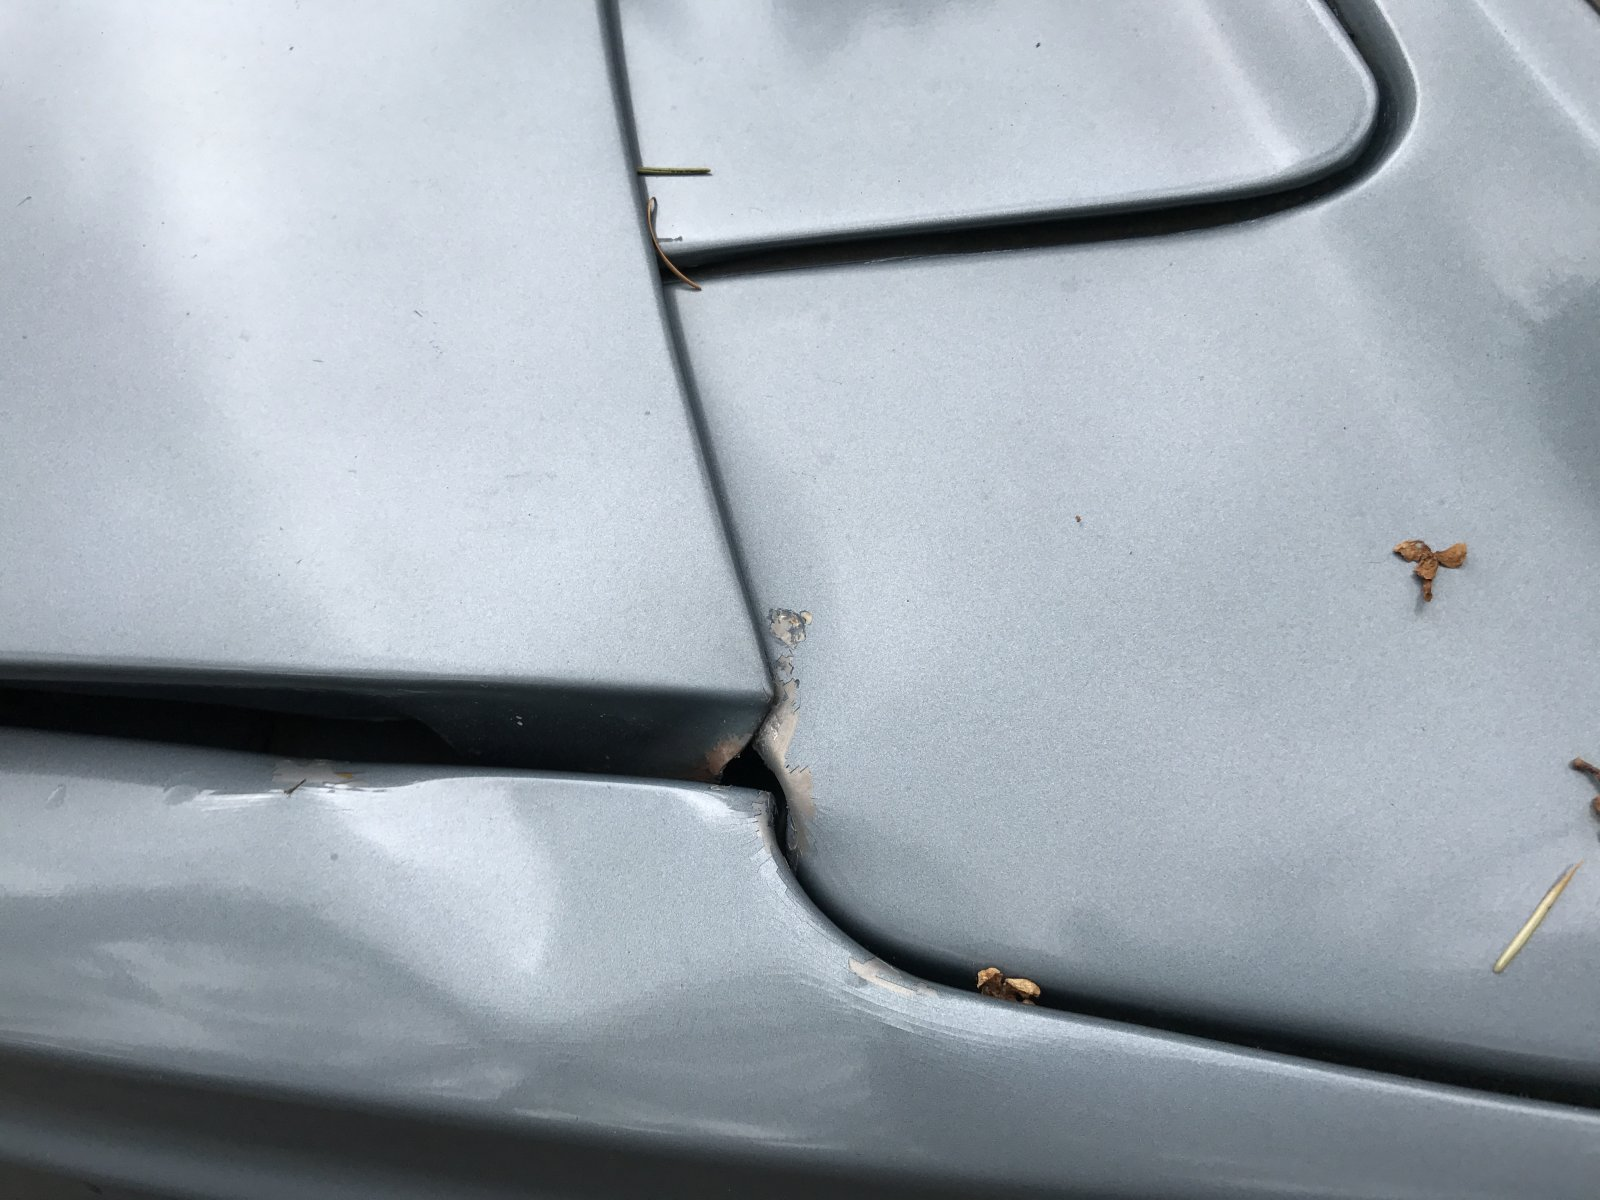 09192017 granny crash damage (10).JPG